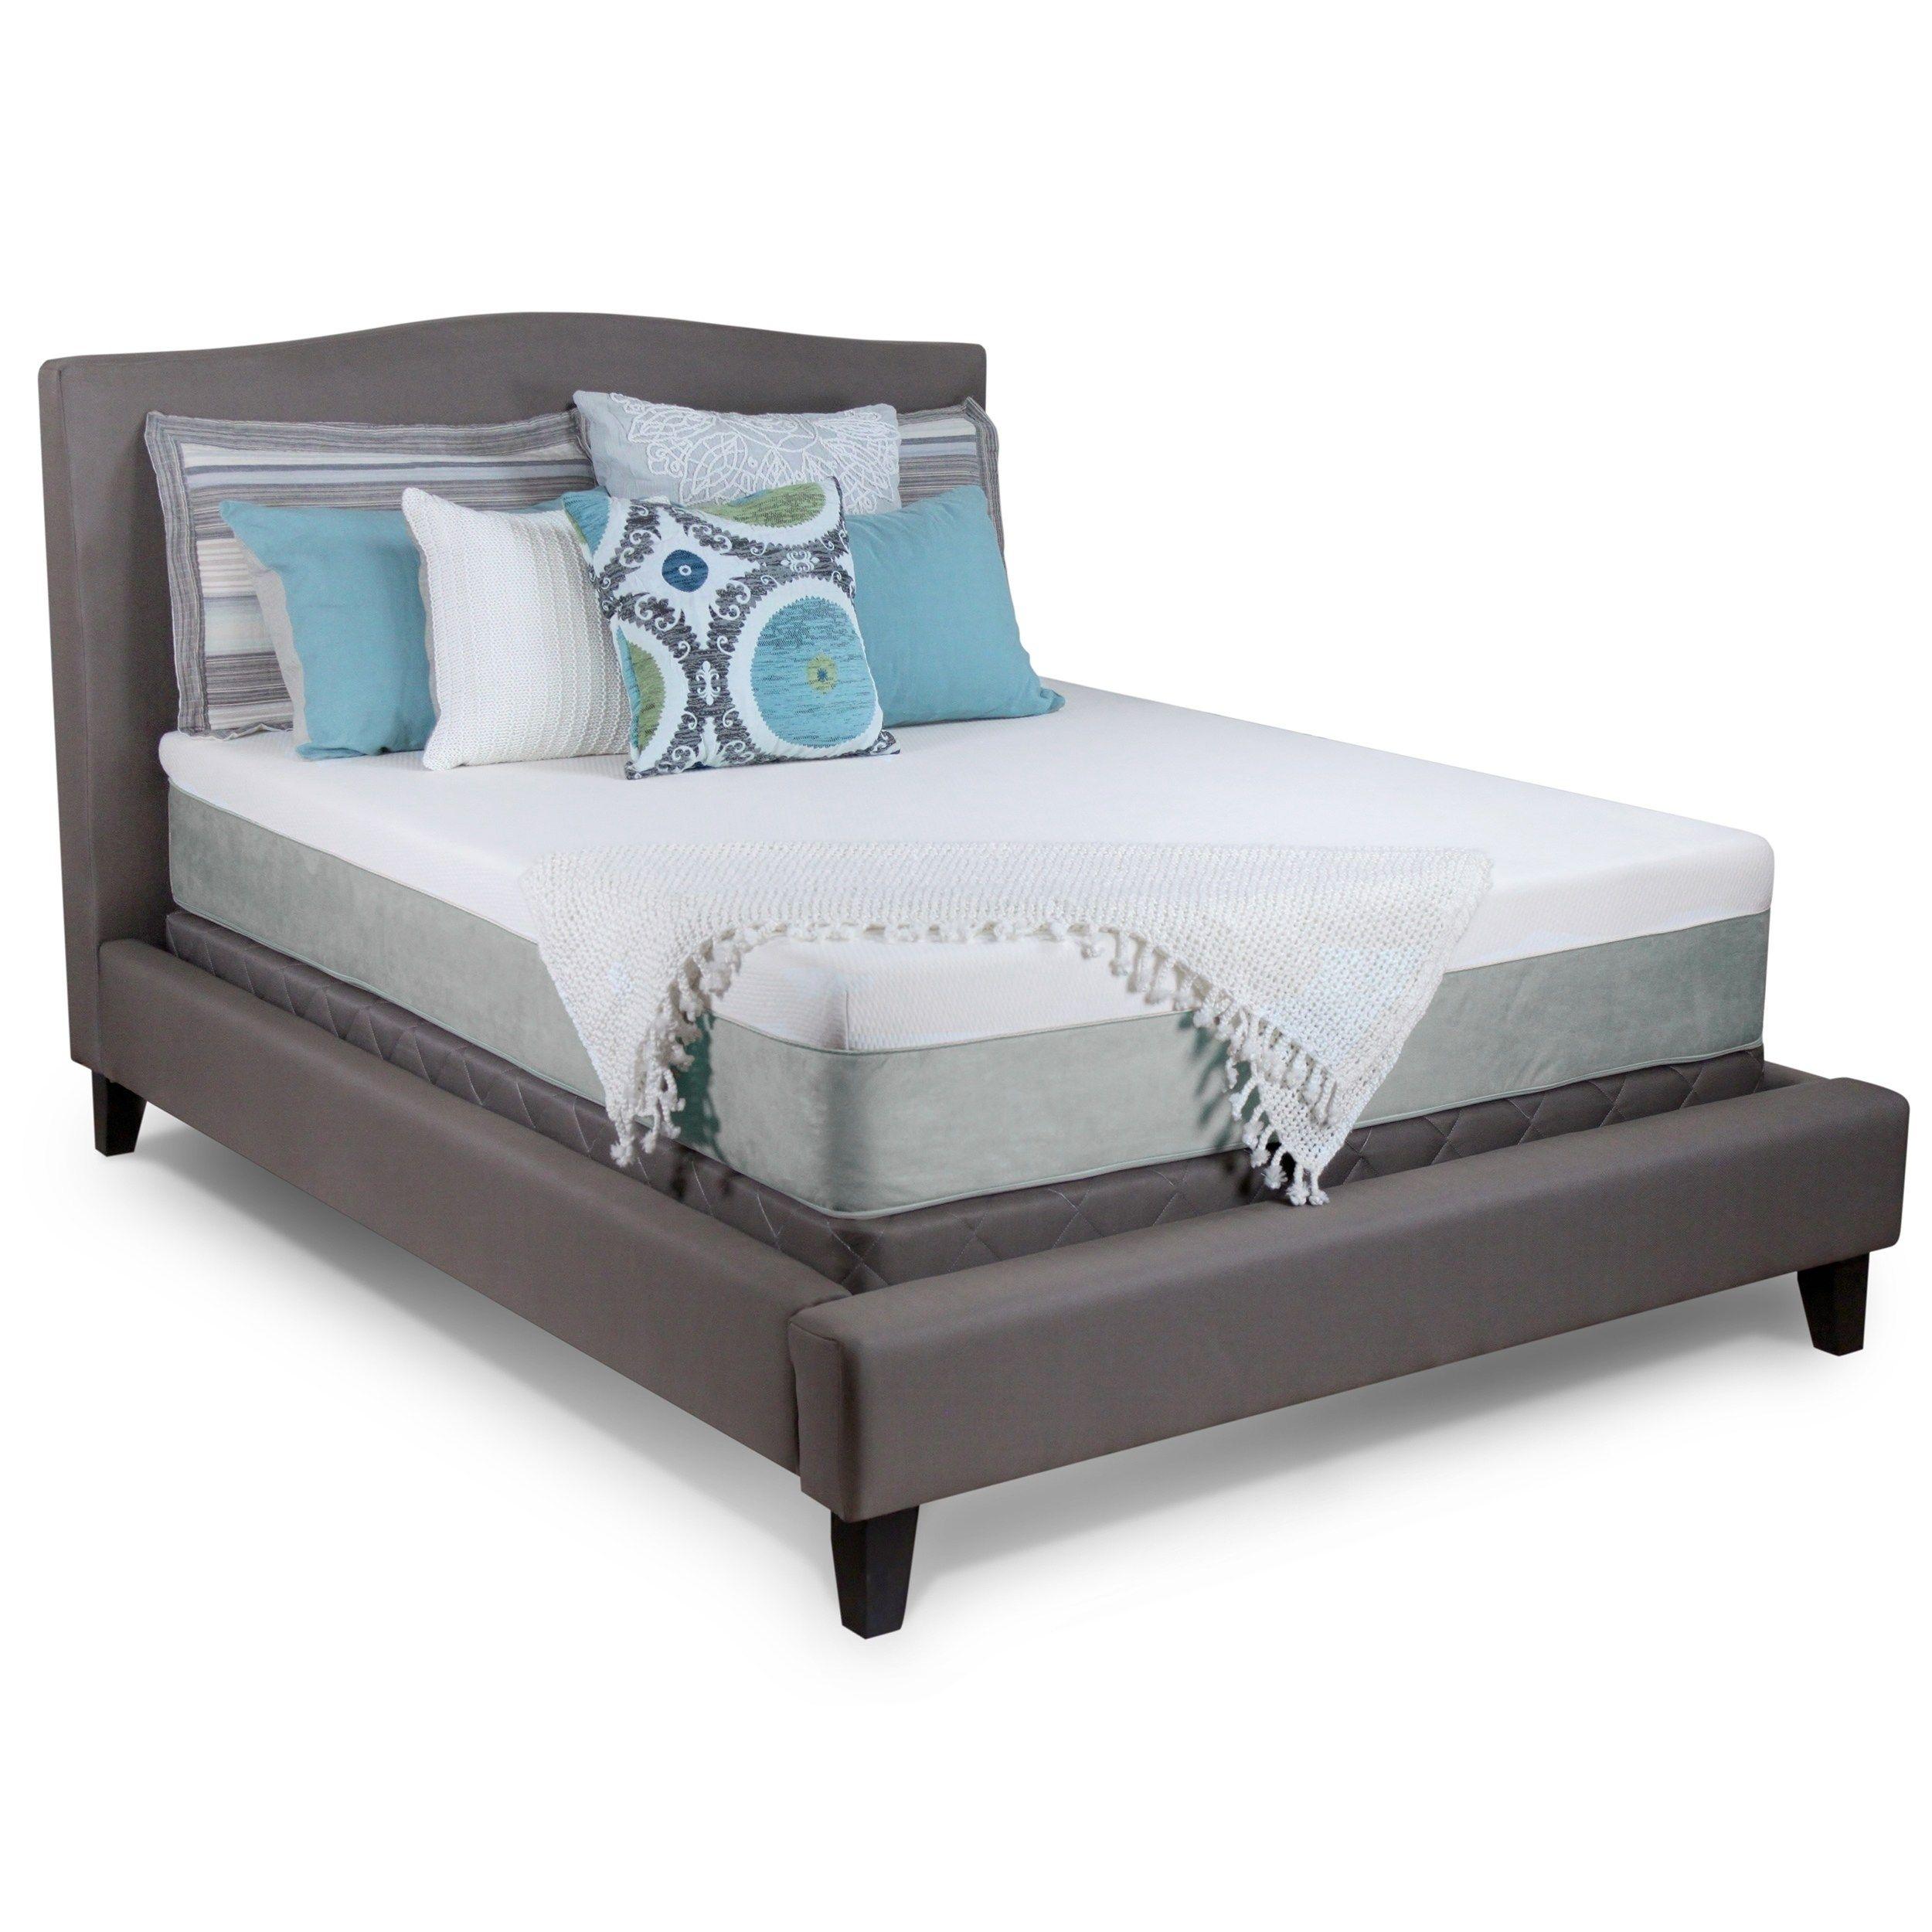 Select Luxury Ultra Plush 11 Inch Twin Size Cool Gel Memory Foam Mattress Blue Mattress Sets Bedroom Furniture Stores Mattress